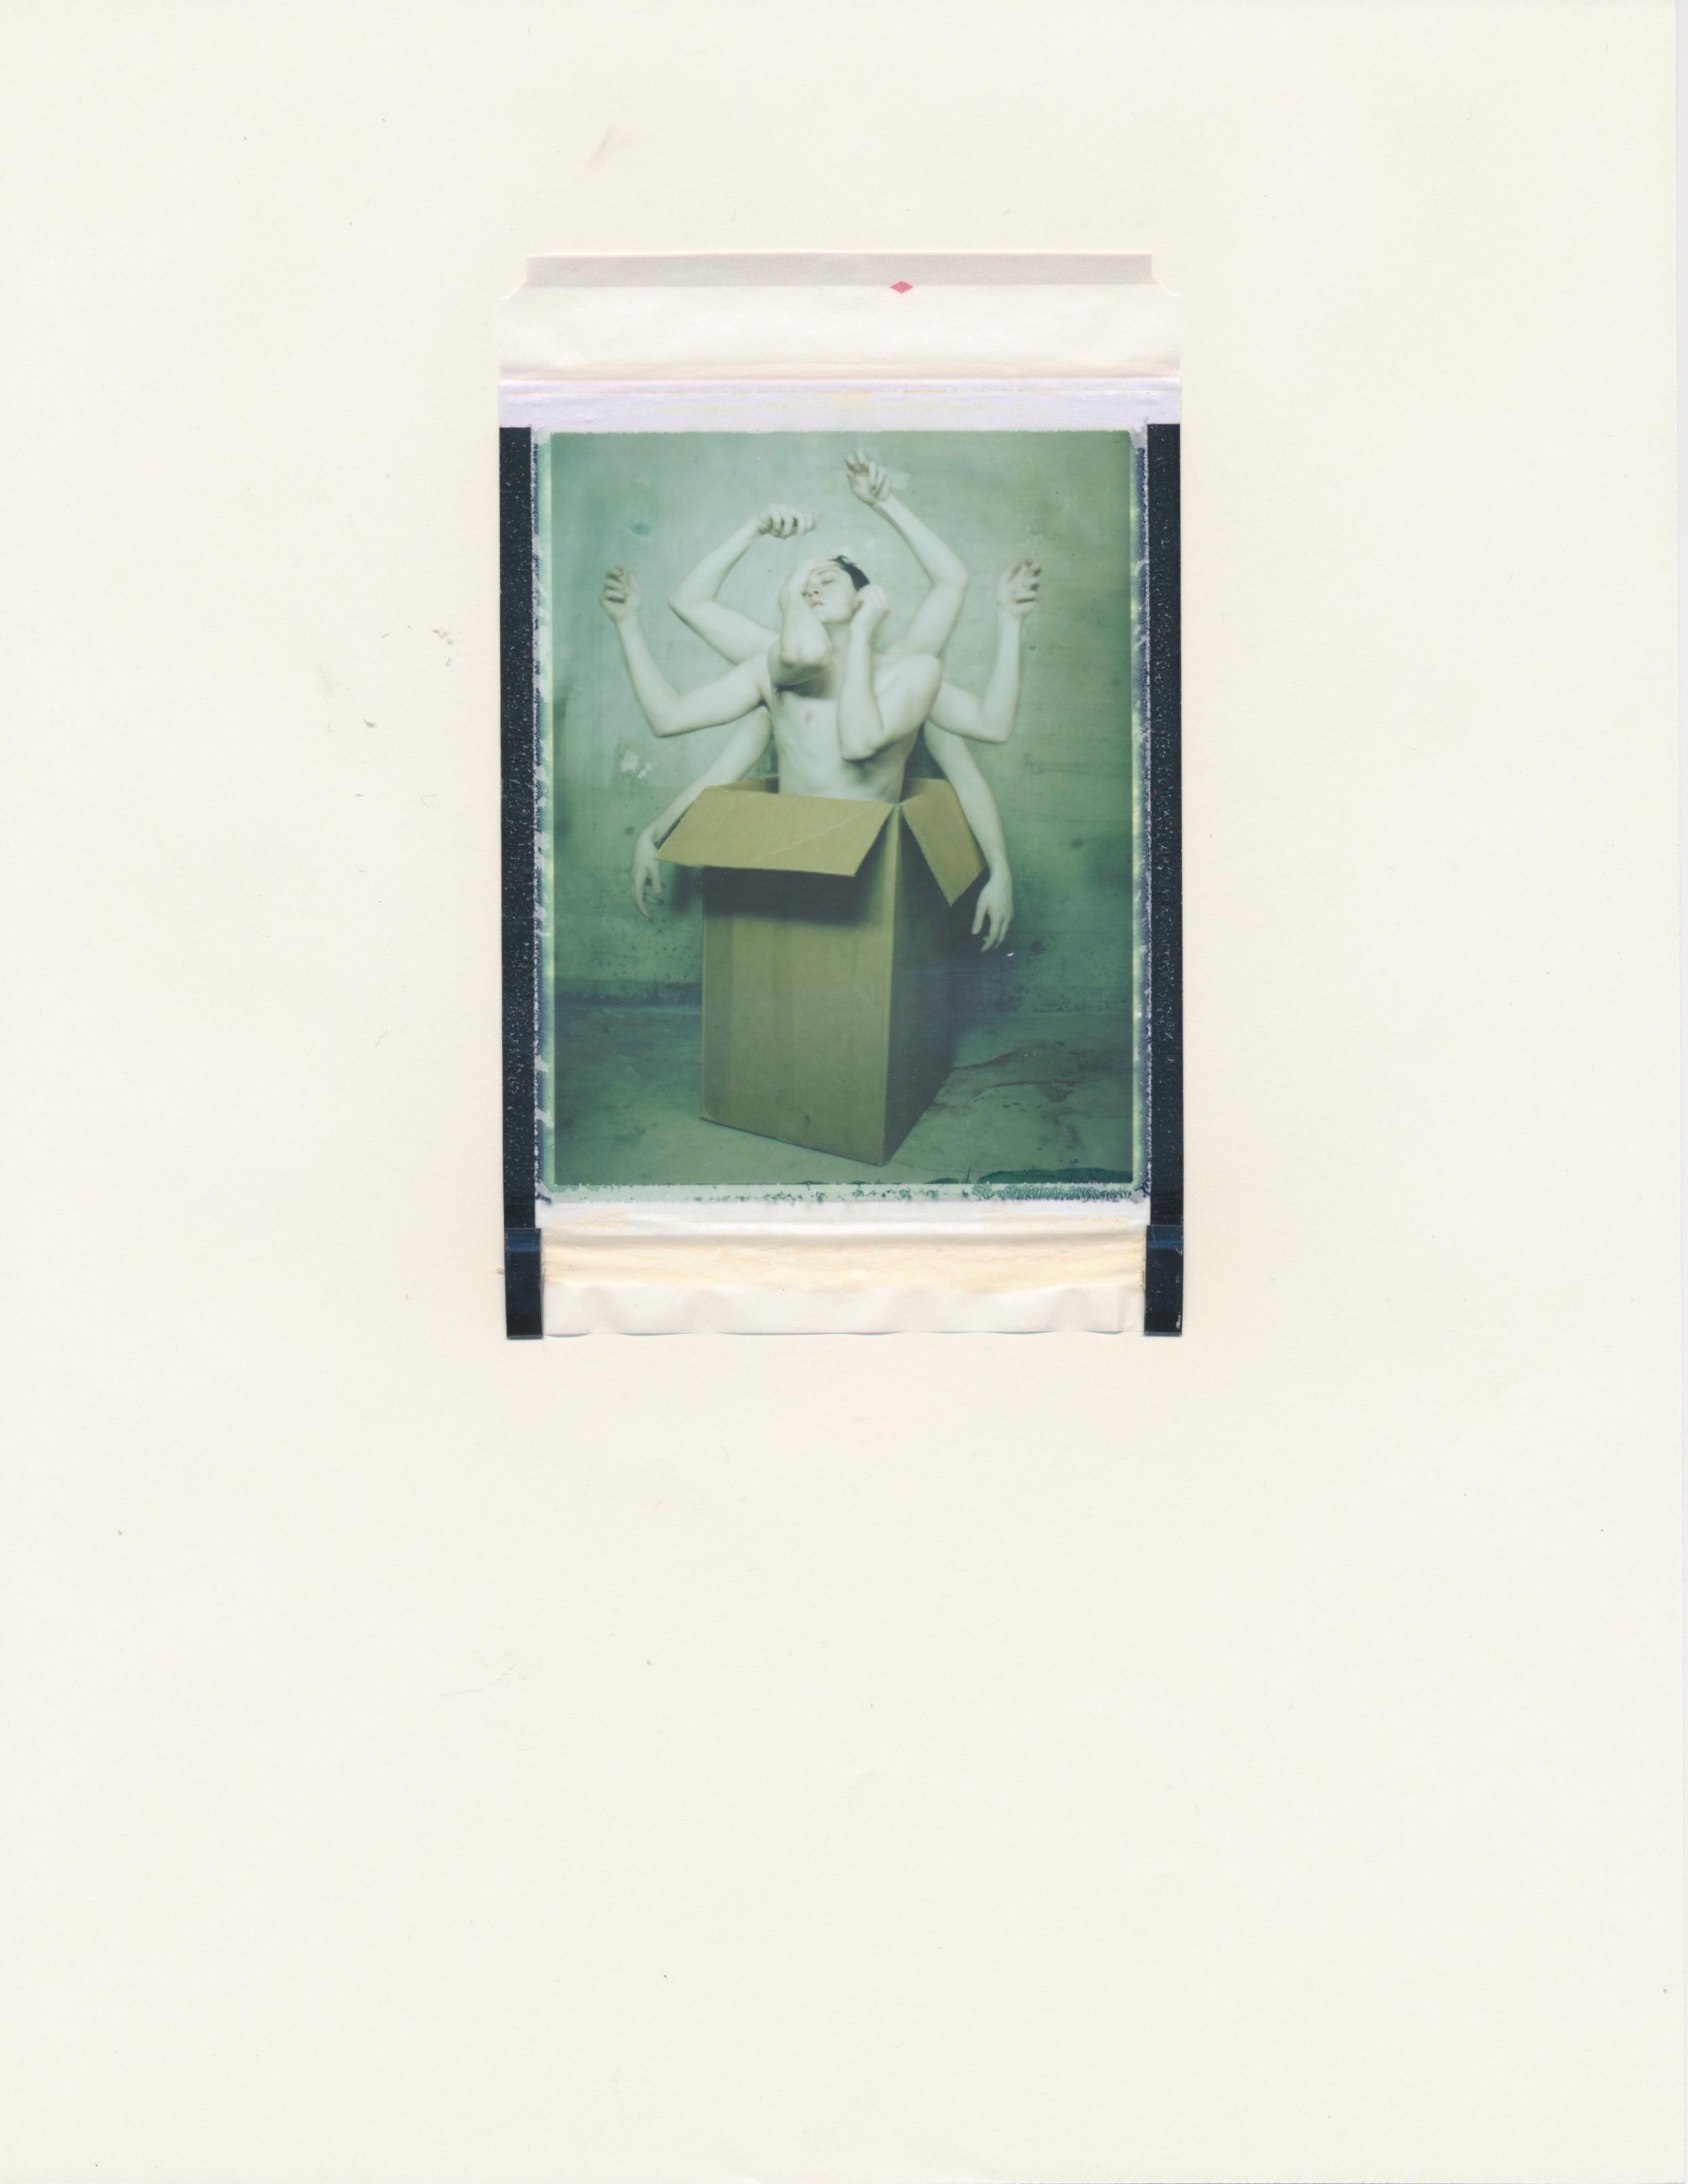 Human Obscura #9(Figure in Box 2)   2015  Diffusion Transfer Print on Paper  8.5x11